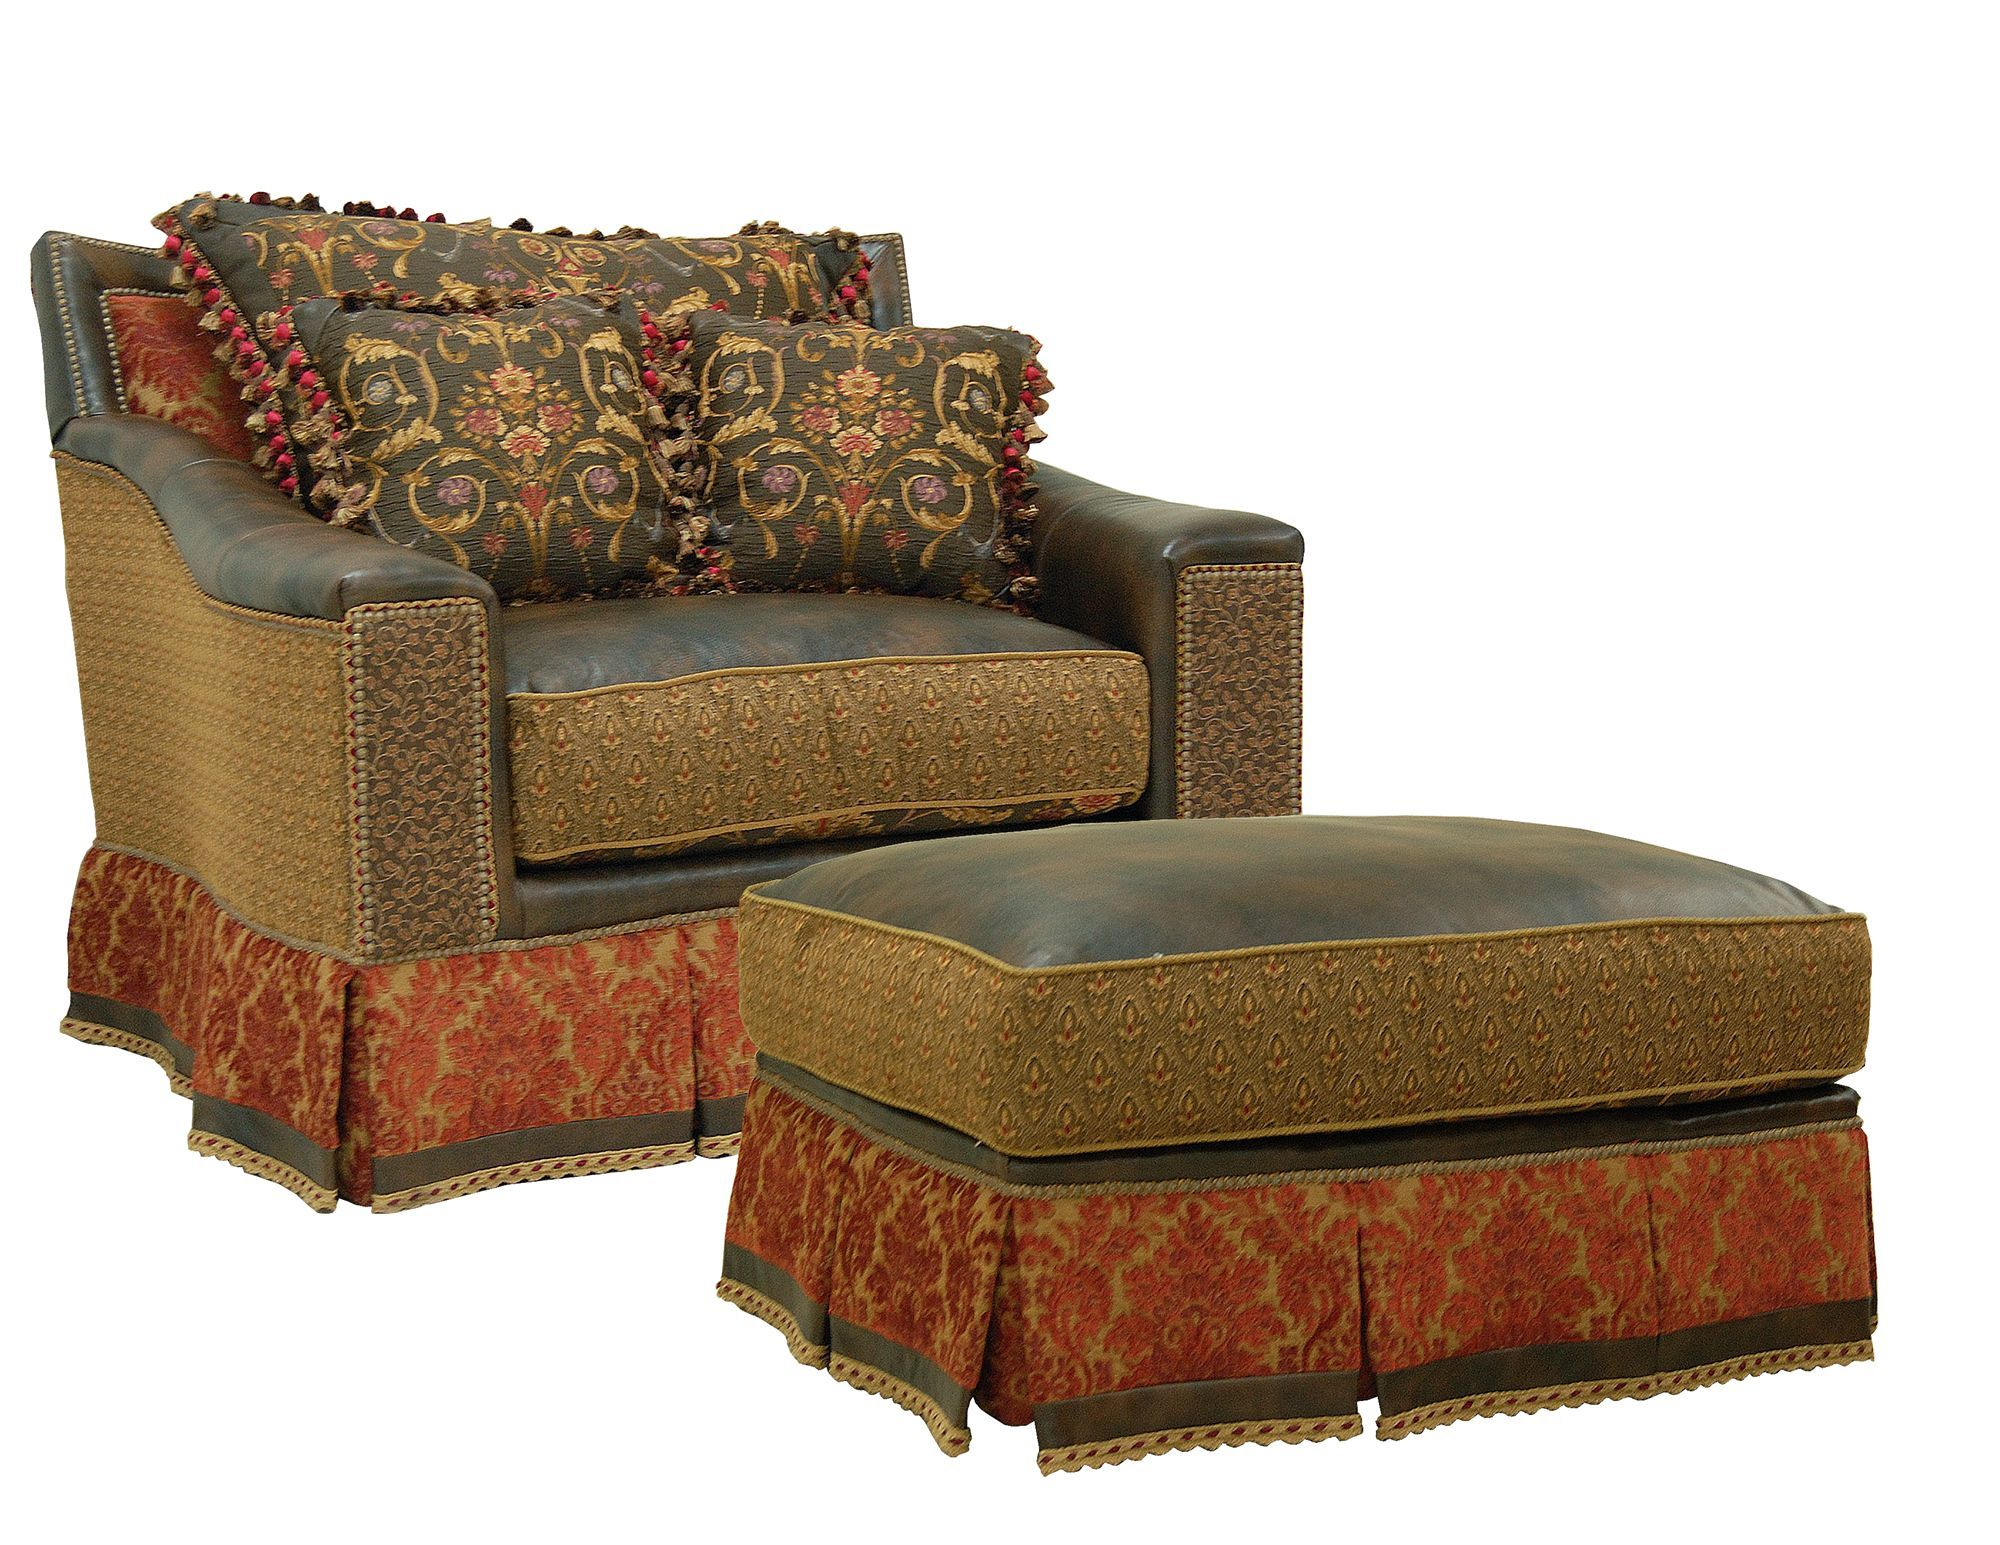 Jeffrey Zimmerman Furniture | Buy Low Price The Jeff Zimmerman Collection  Casjo Chair Plus W Ottoman